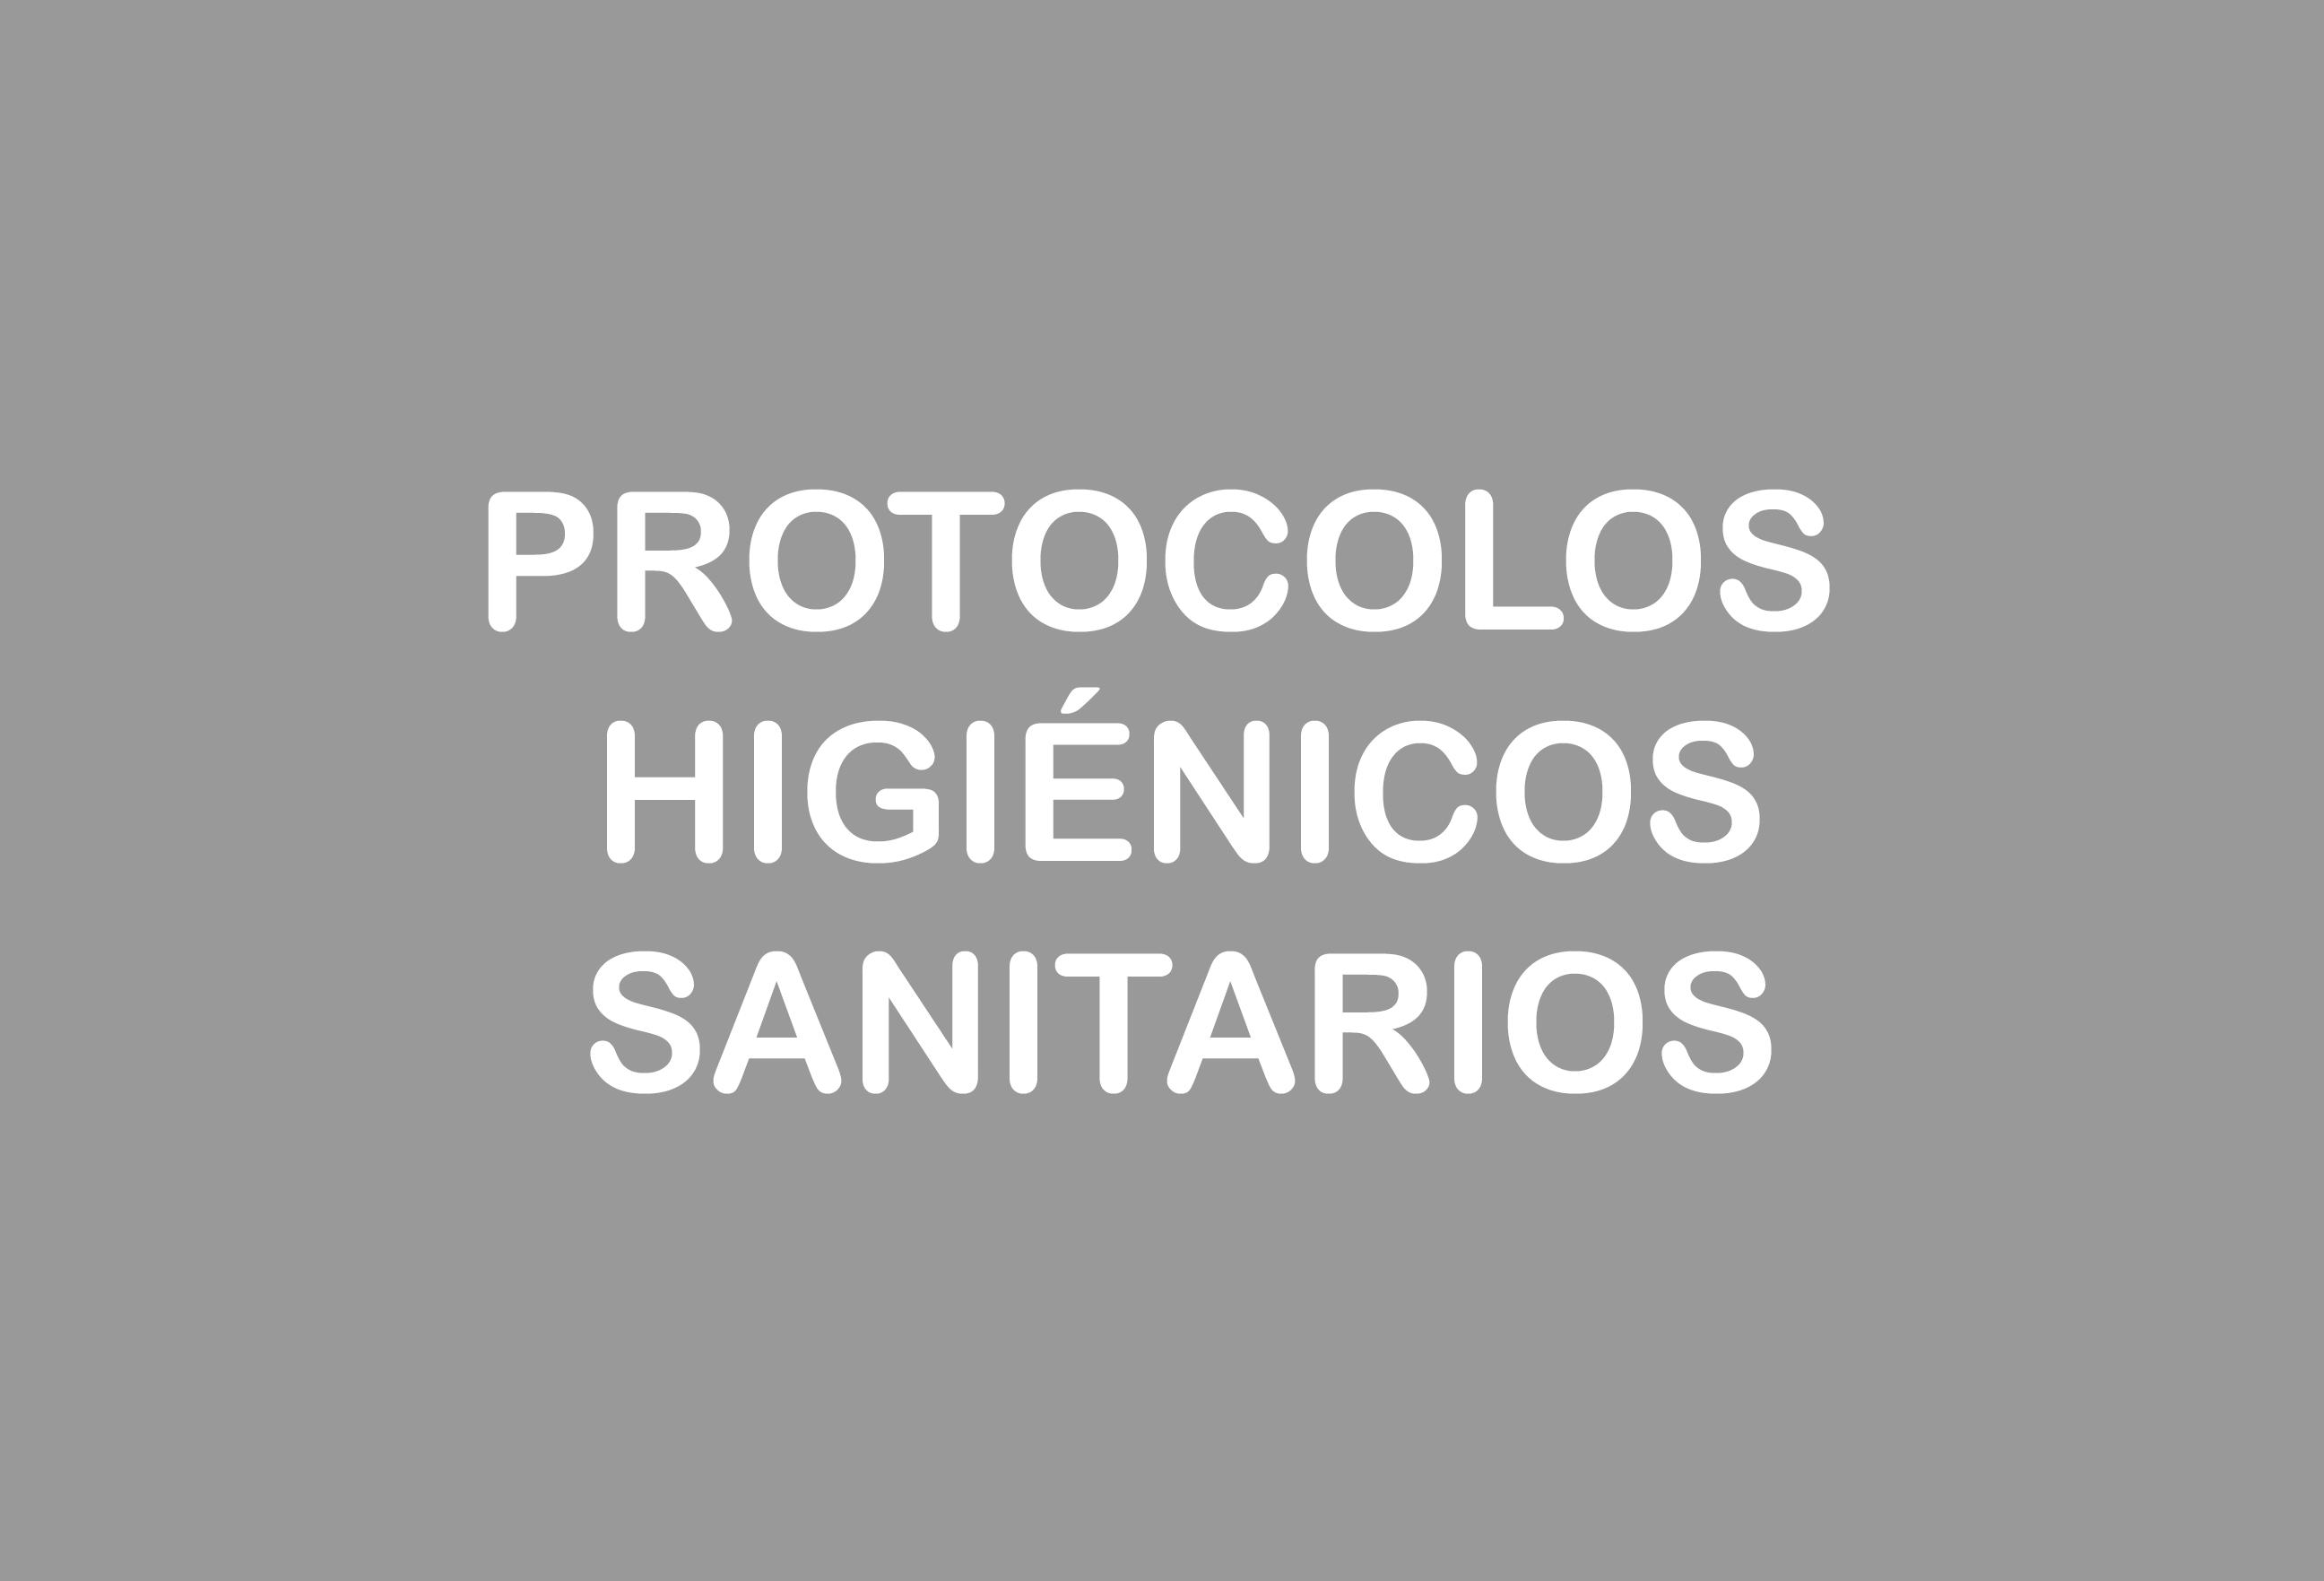 protocolos-higienicos-sanitarios